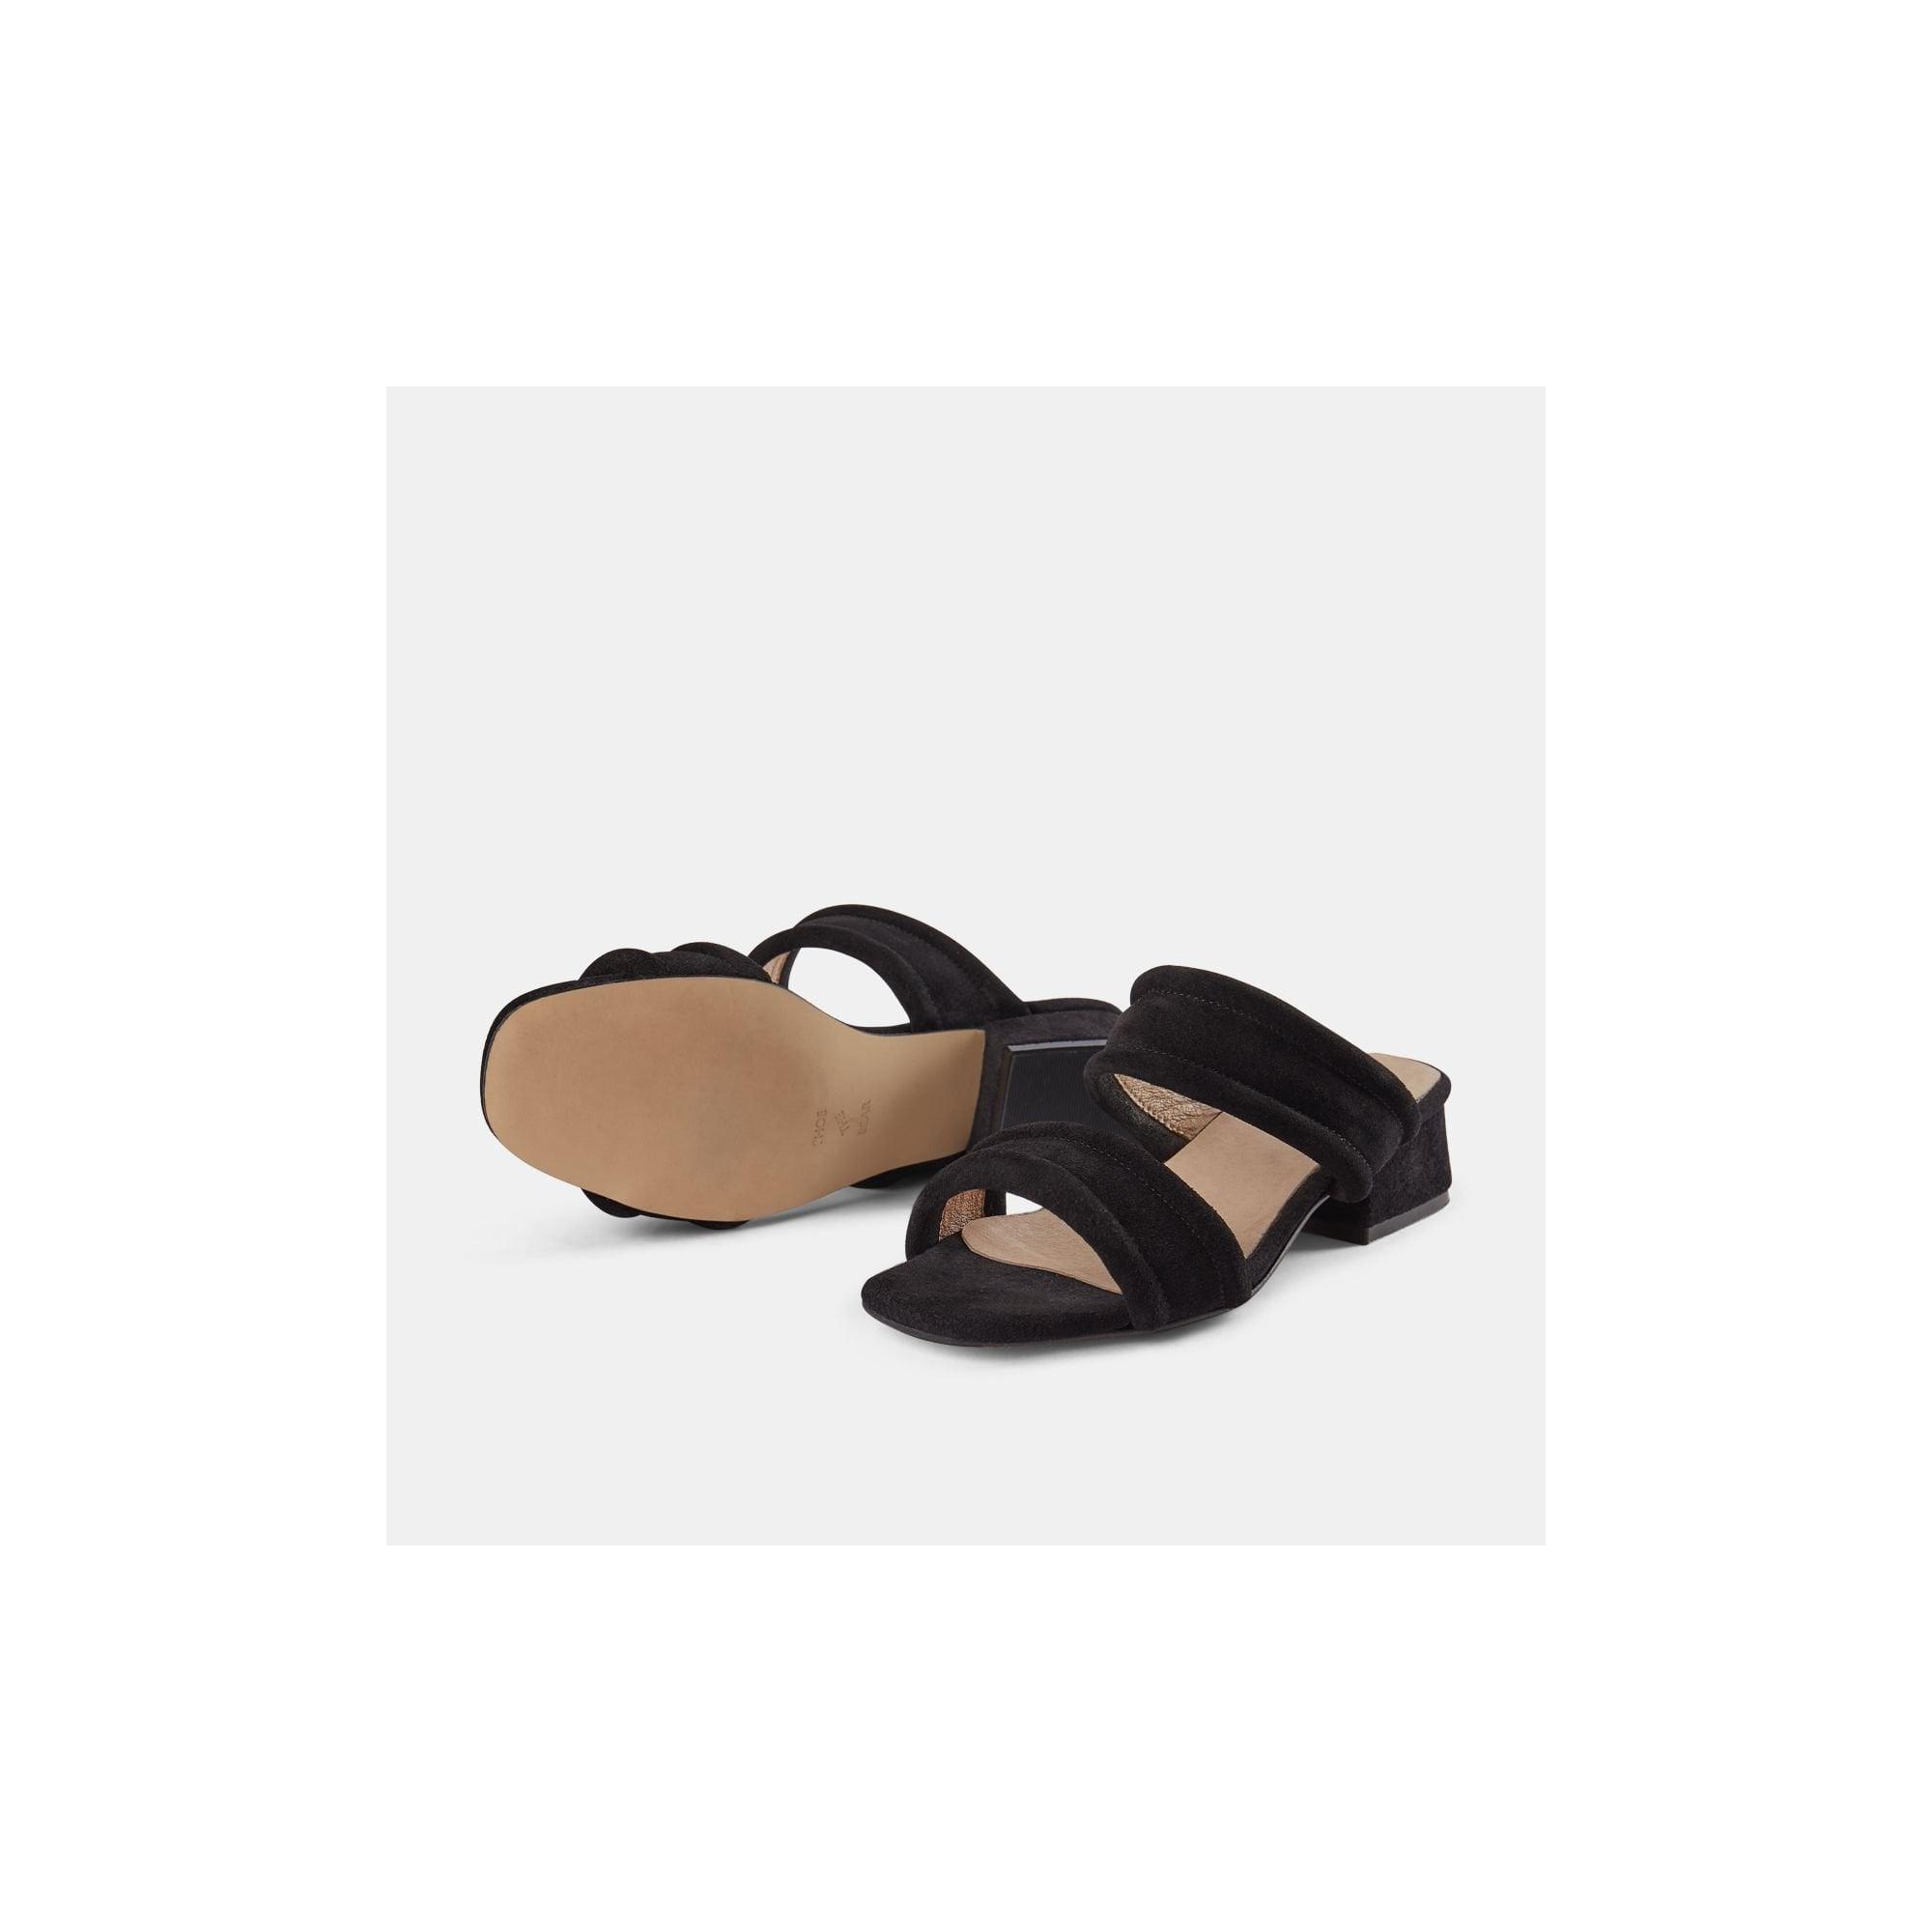 BlackCollenamp; In Clare Slide Sandals Yasmin m8n0OvNw